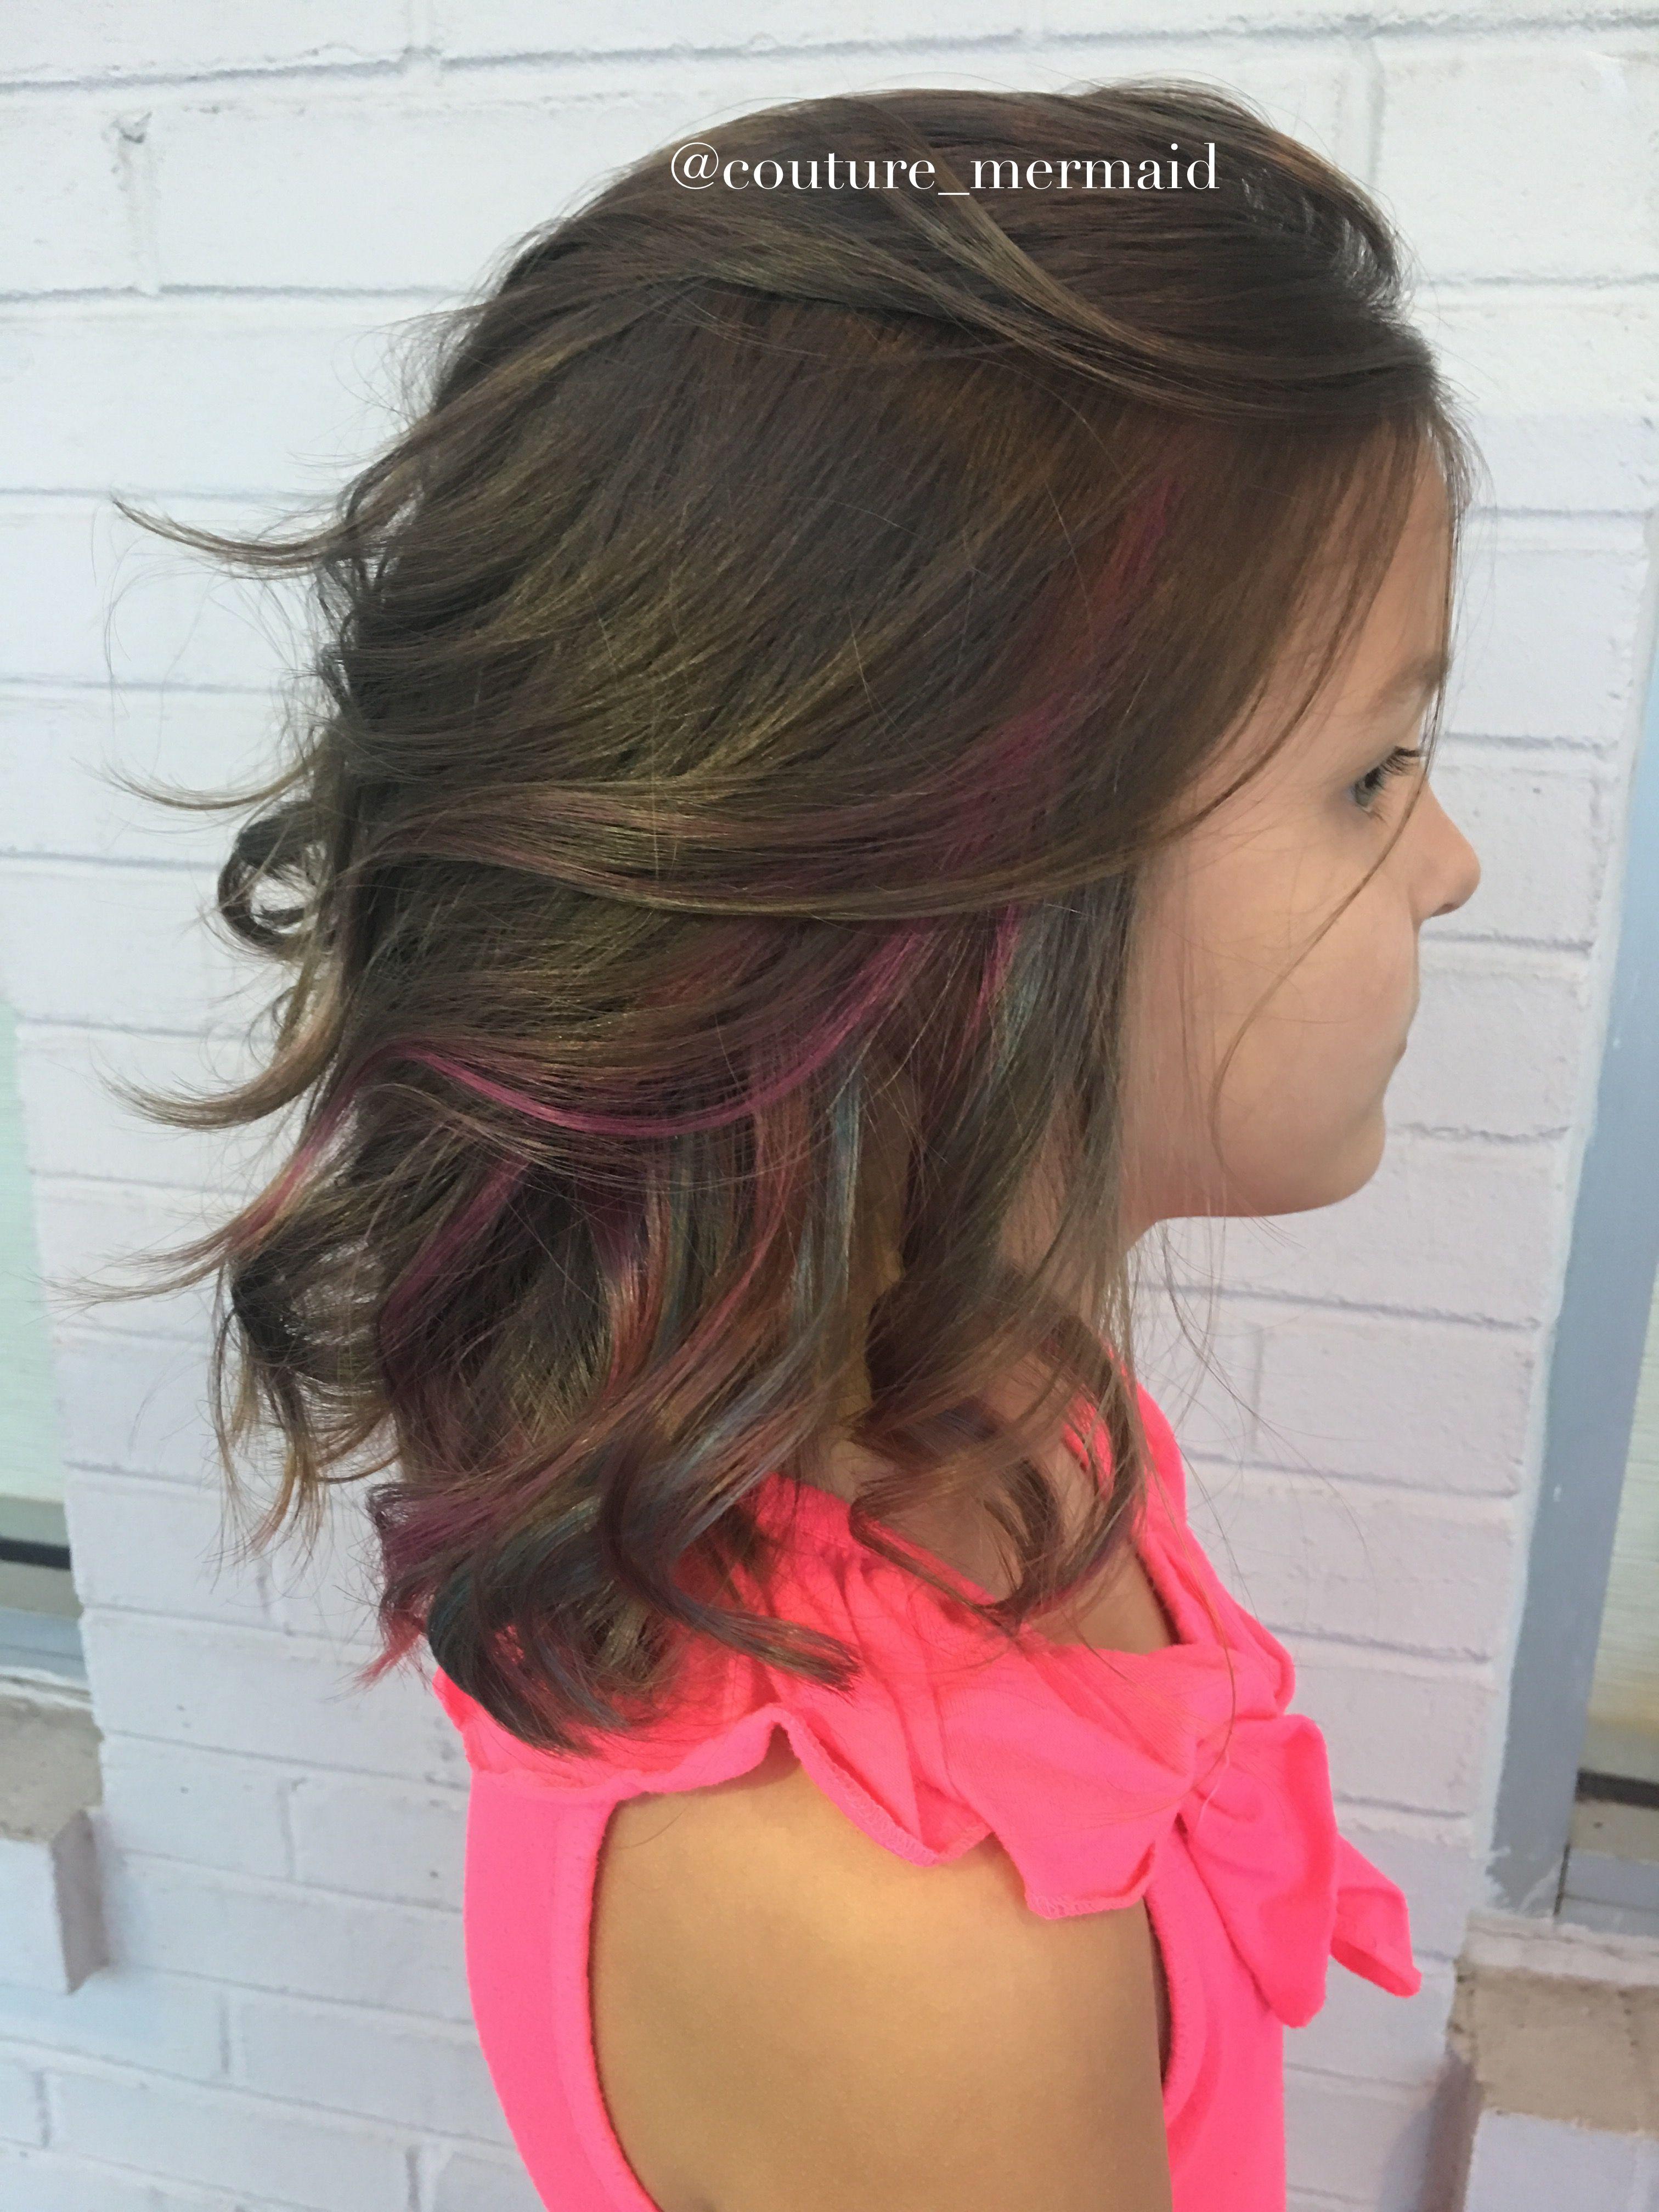 Peekaboo Highlights Peekaboo Highlights For Children Children S Hair Kids Hair Color Hair Color Streaks Kids Hairstyles